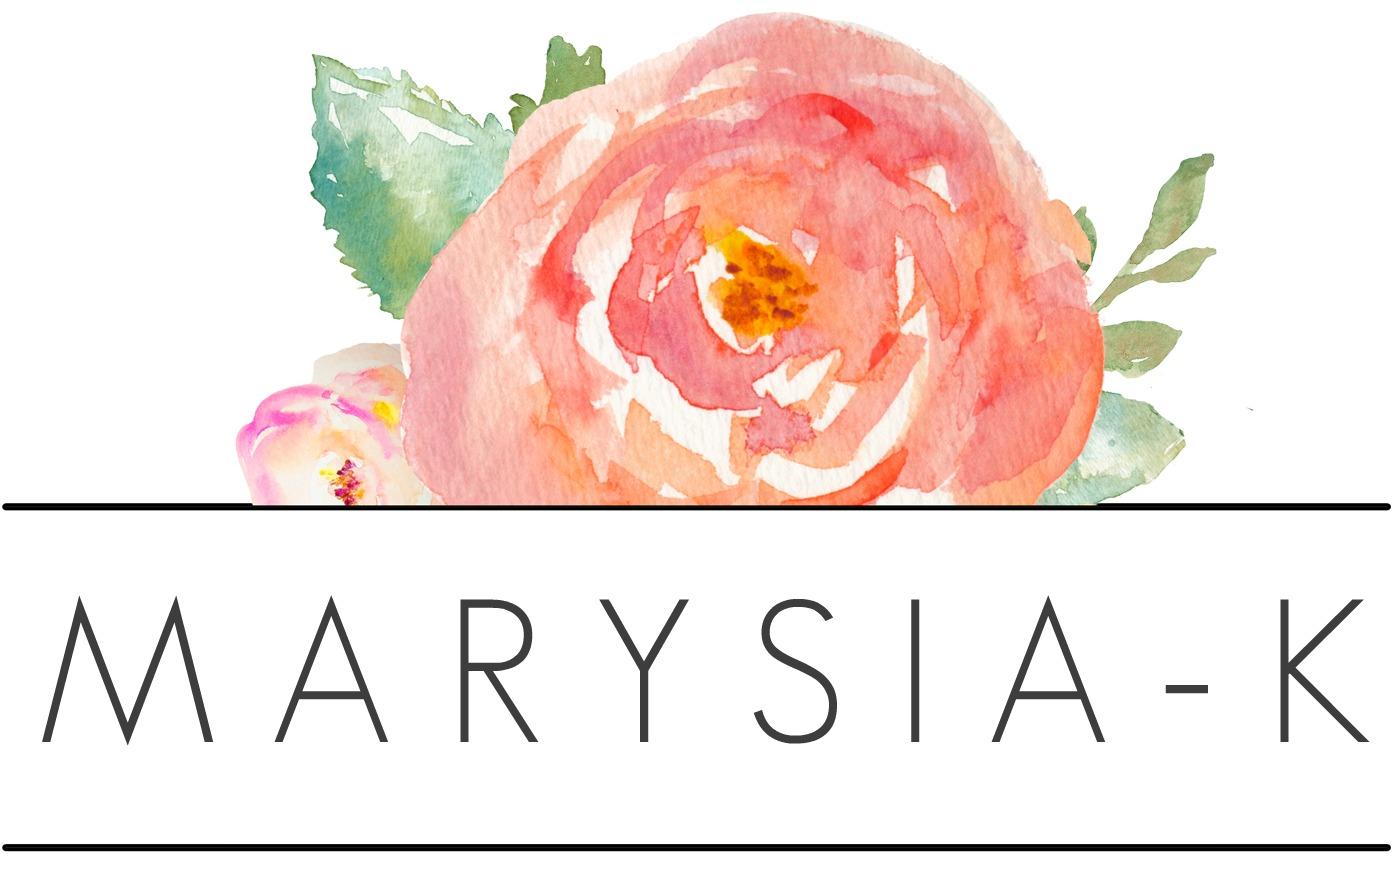 marysia-k